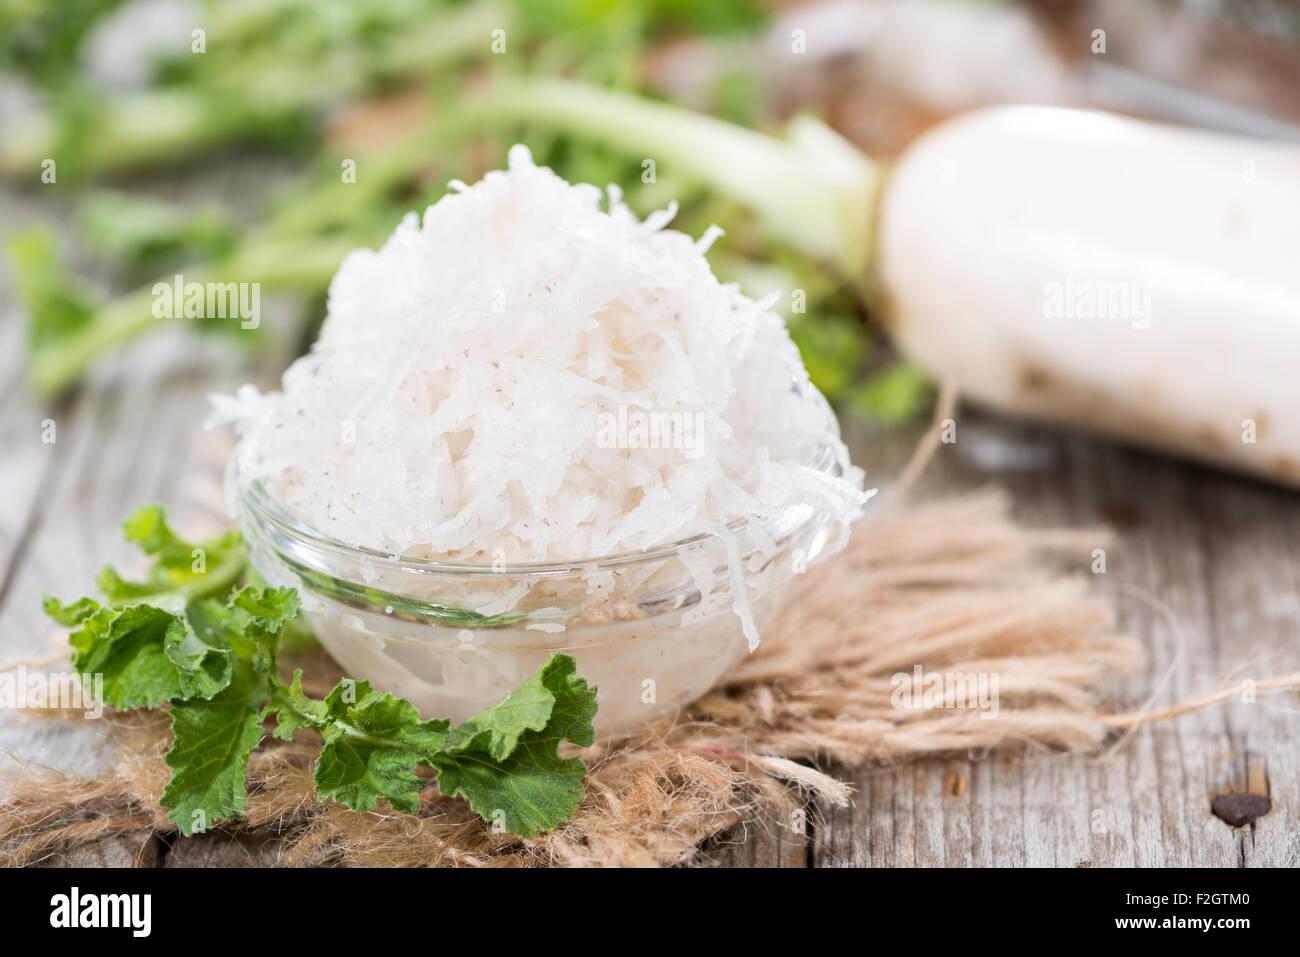 Fresh grated Horseradish on dark wooden background - Stock Image